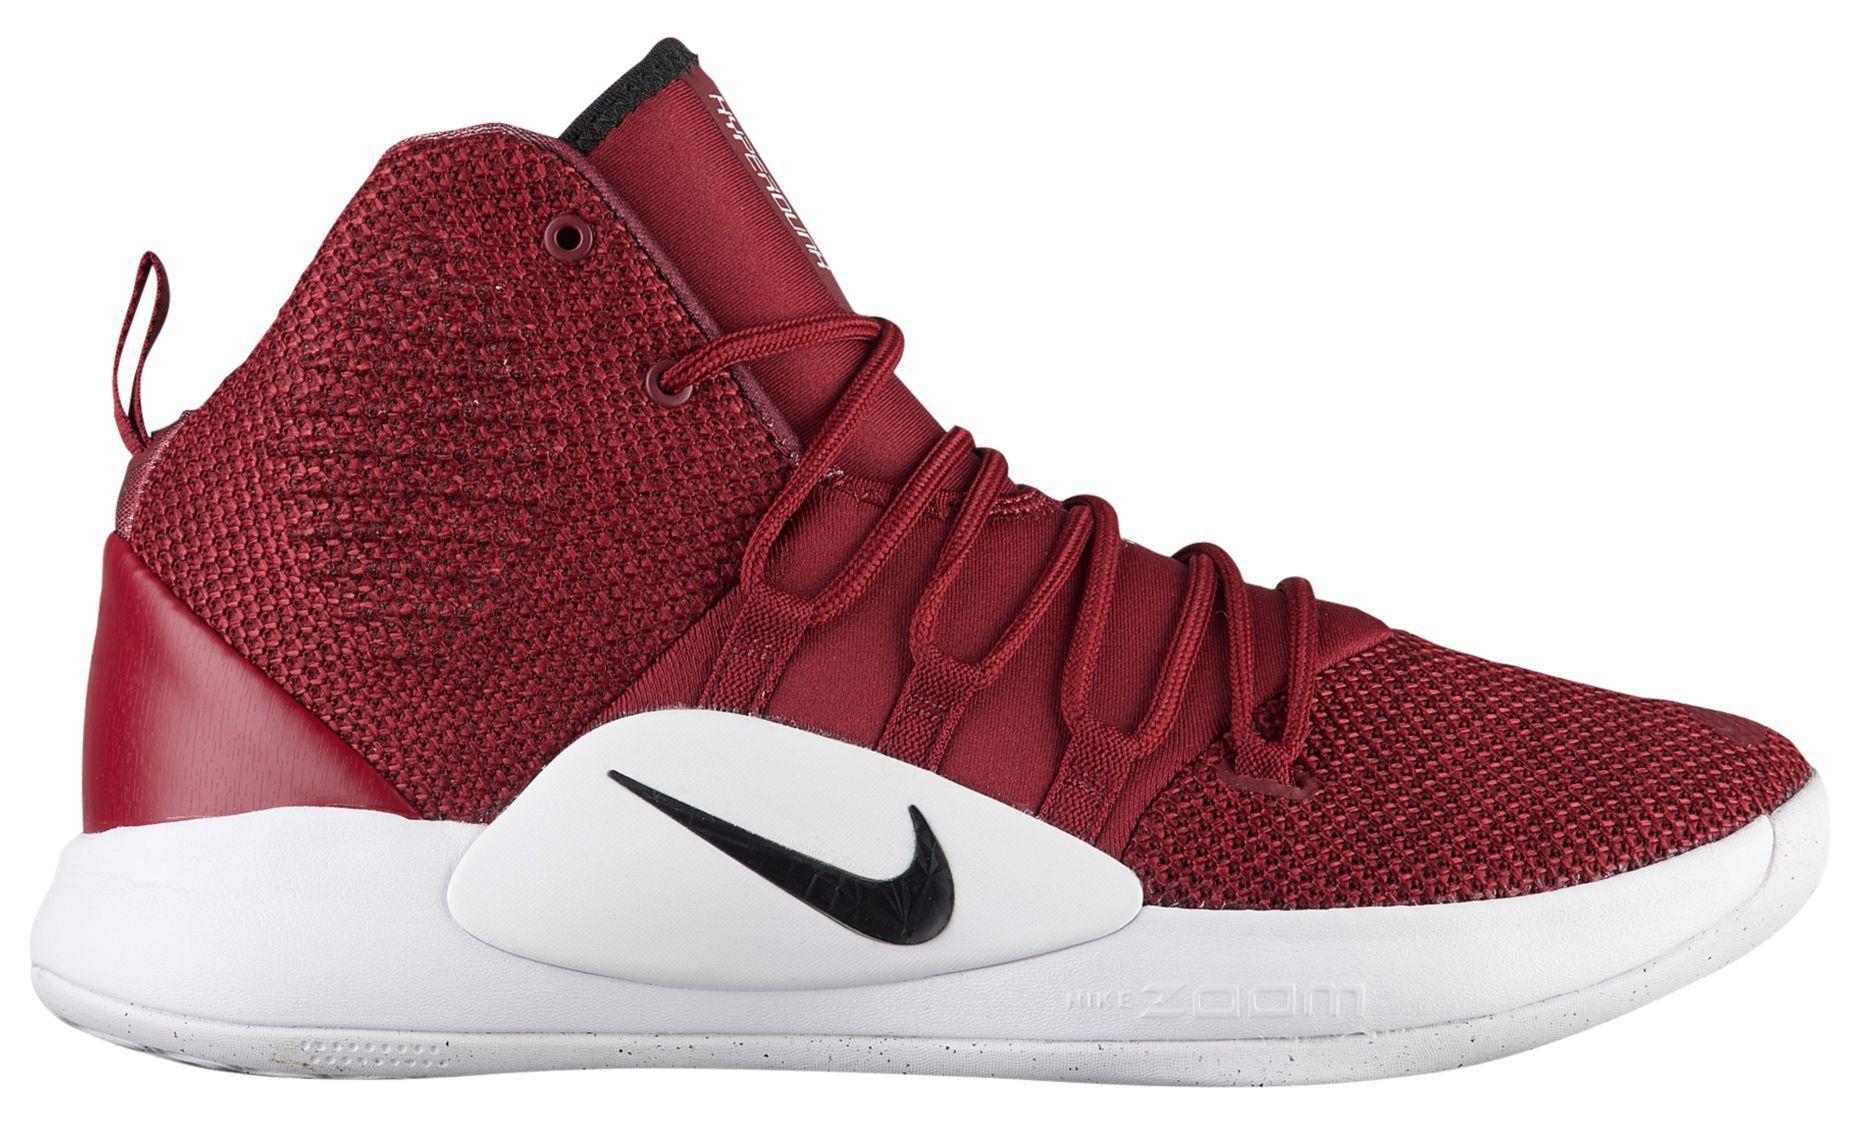 detailed look c325f aef7d The Nike 2009 nike hyperdunk tb basketball . ...